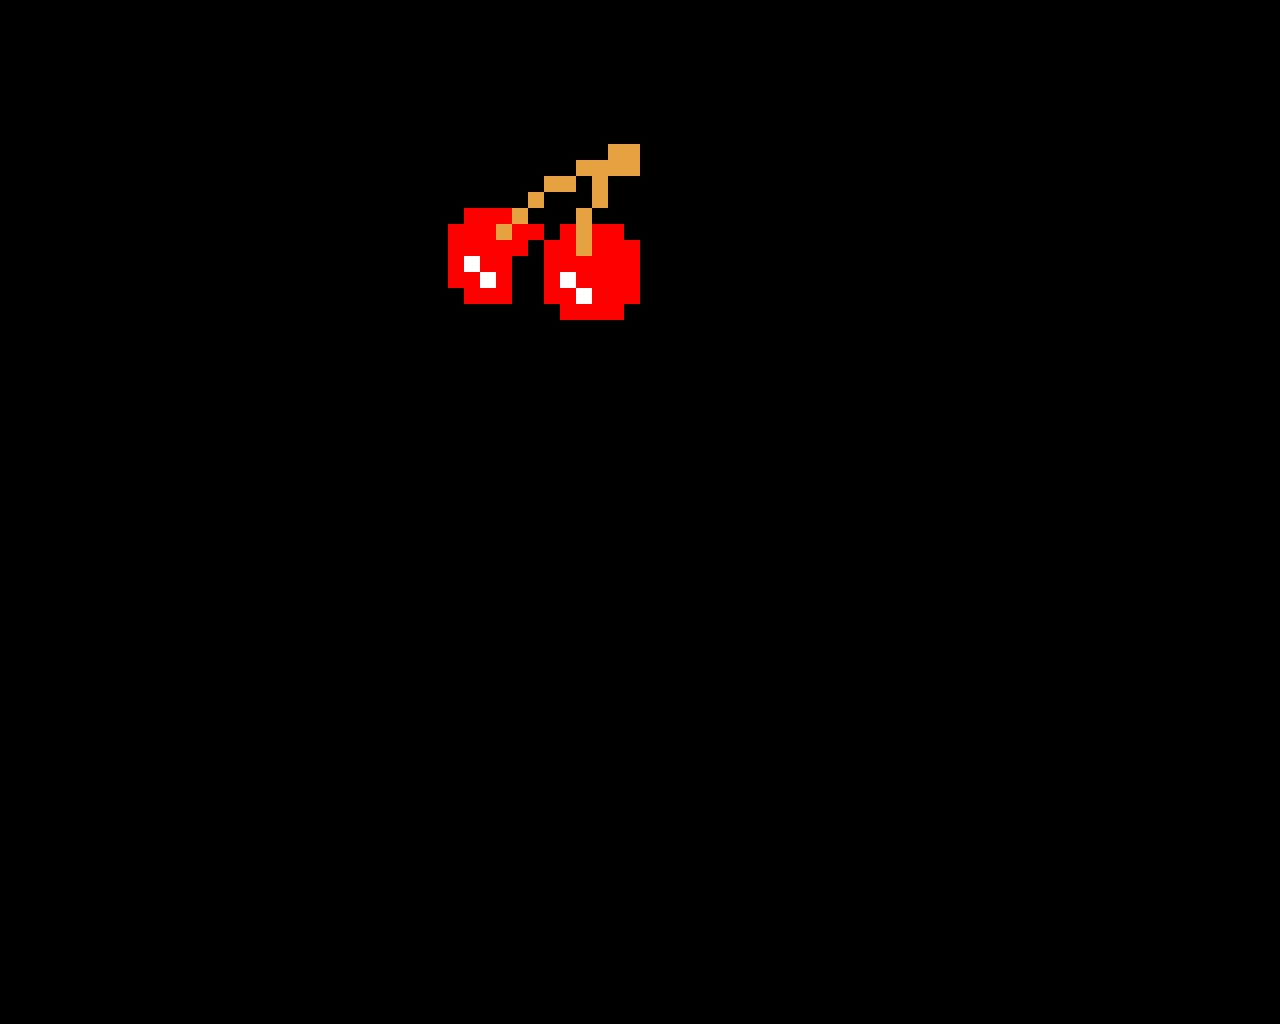 Pac man cherry bonus item